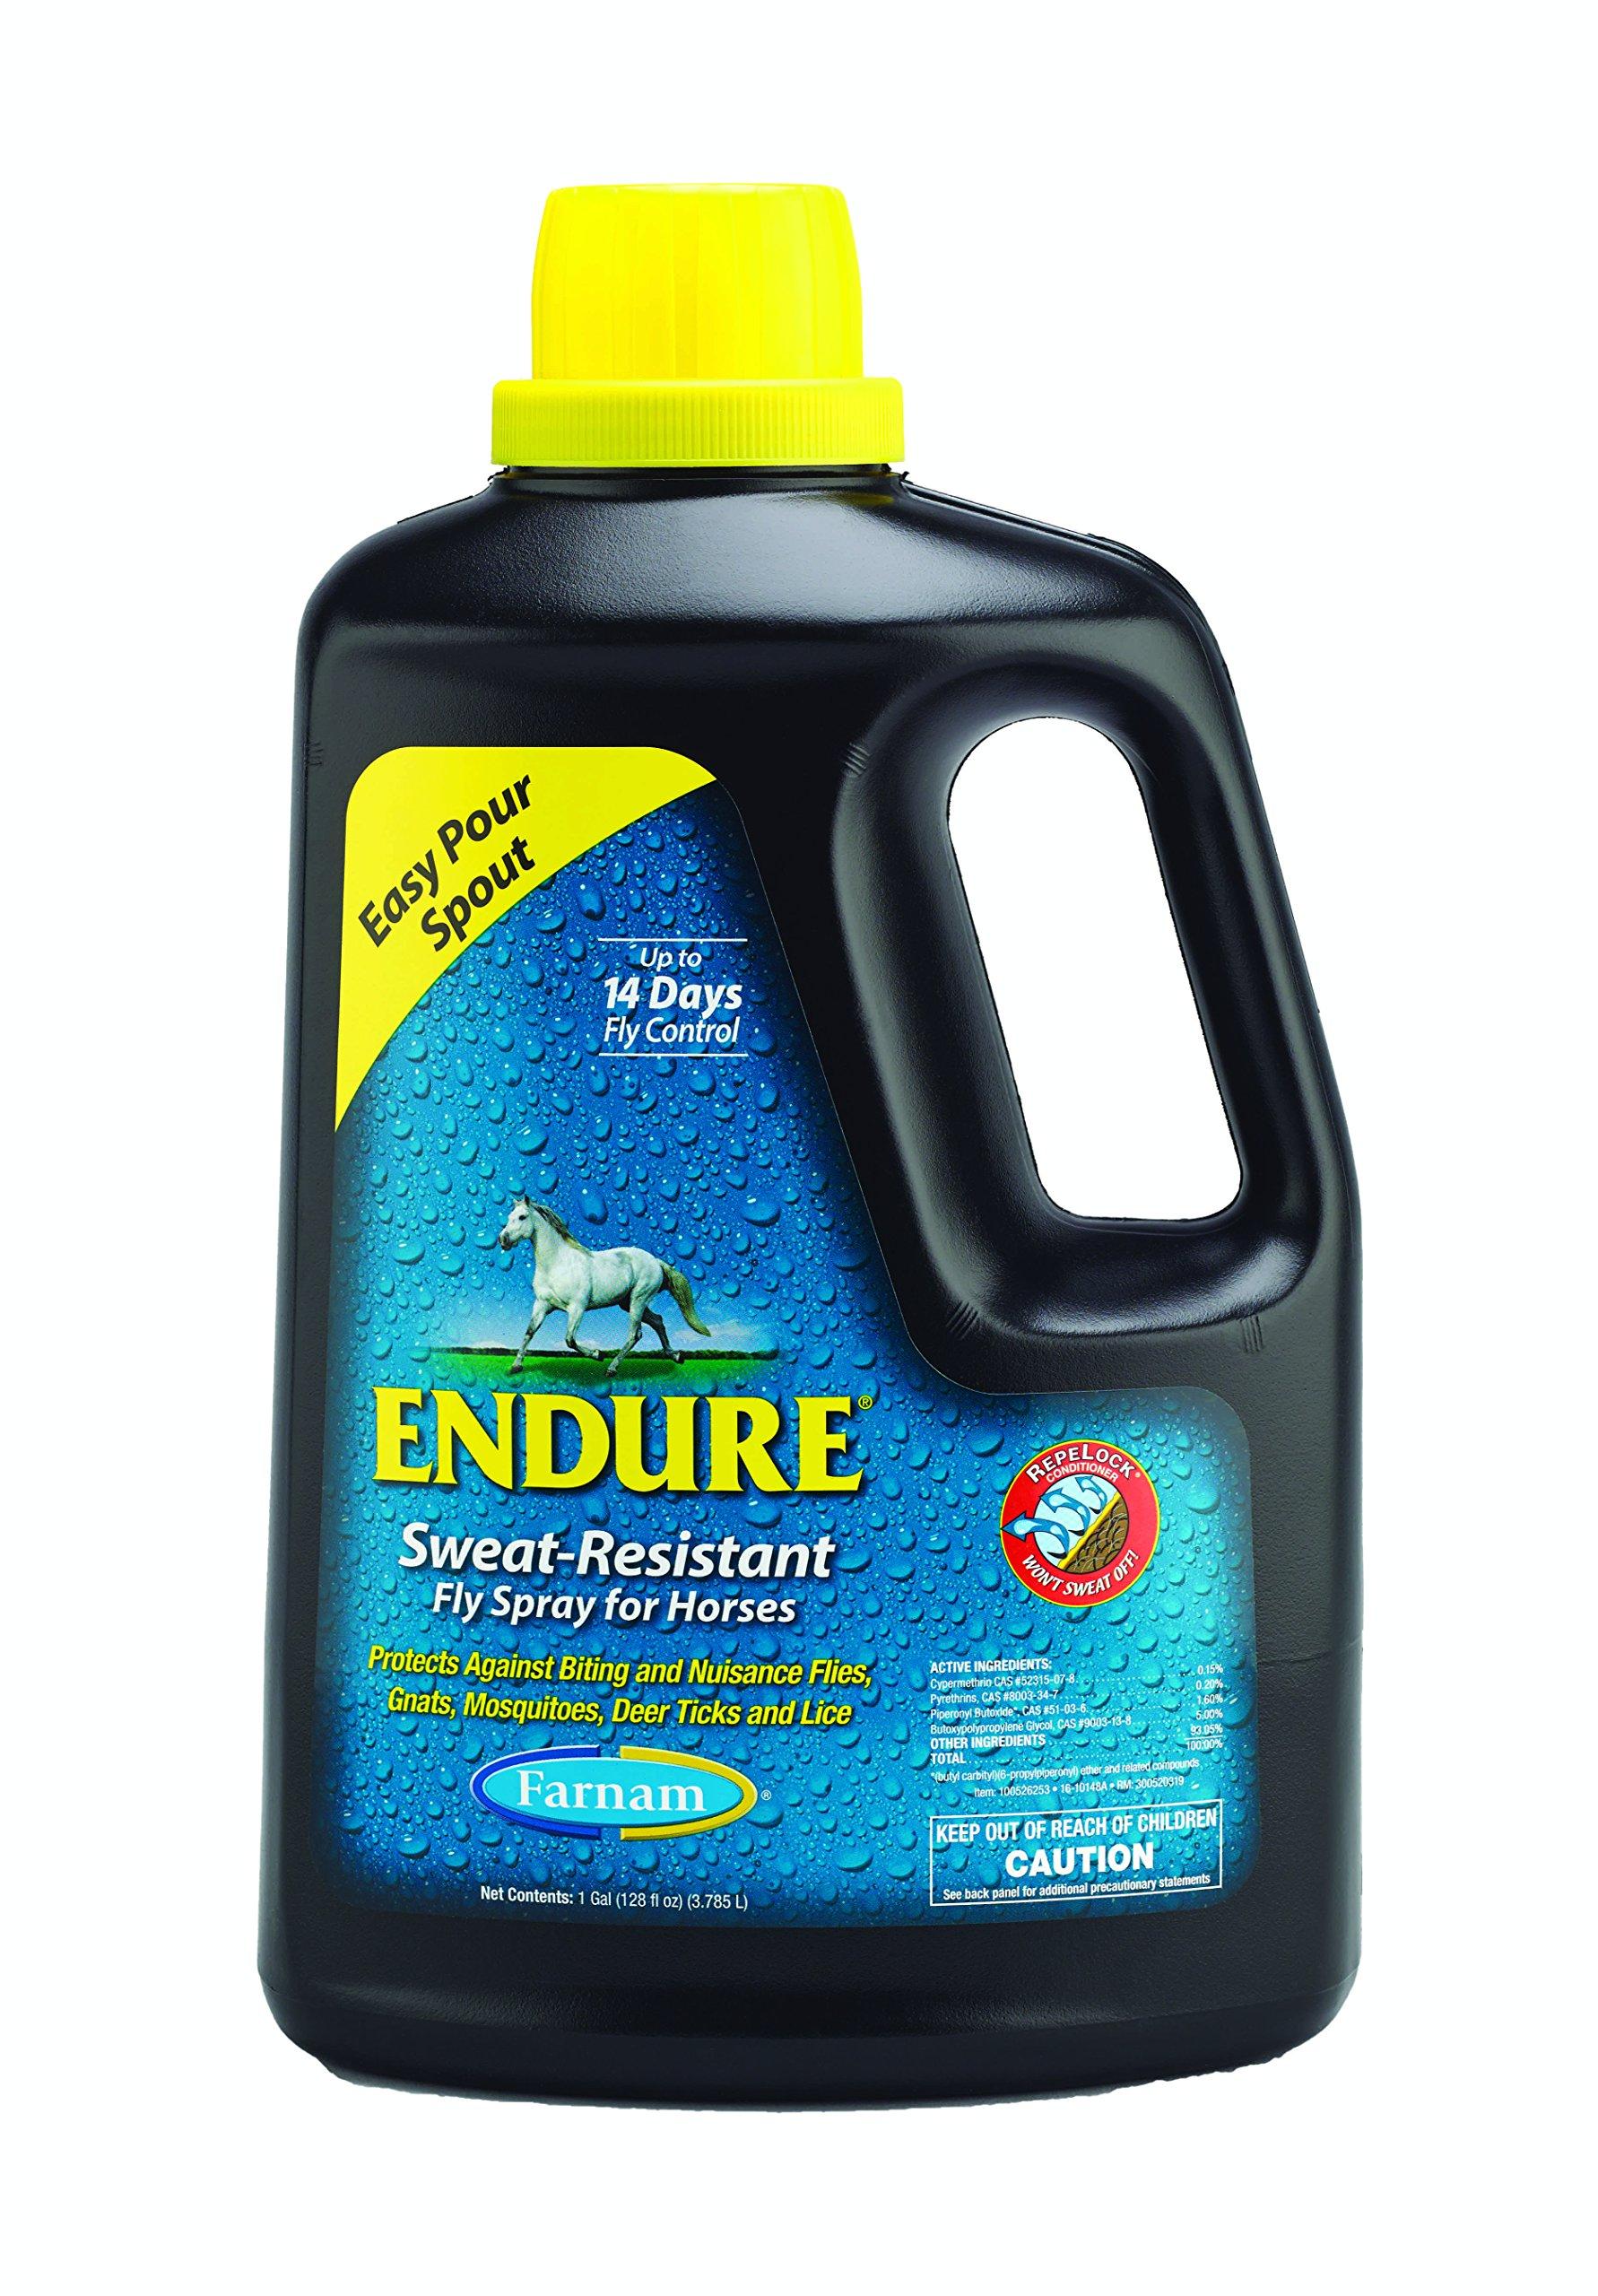 Farnam Equine Endure Sweat-Resistant Fly Spray for Horses